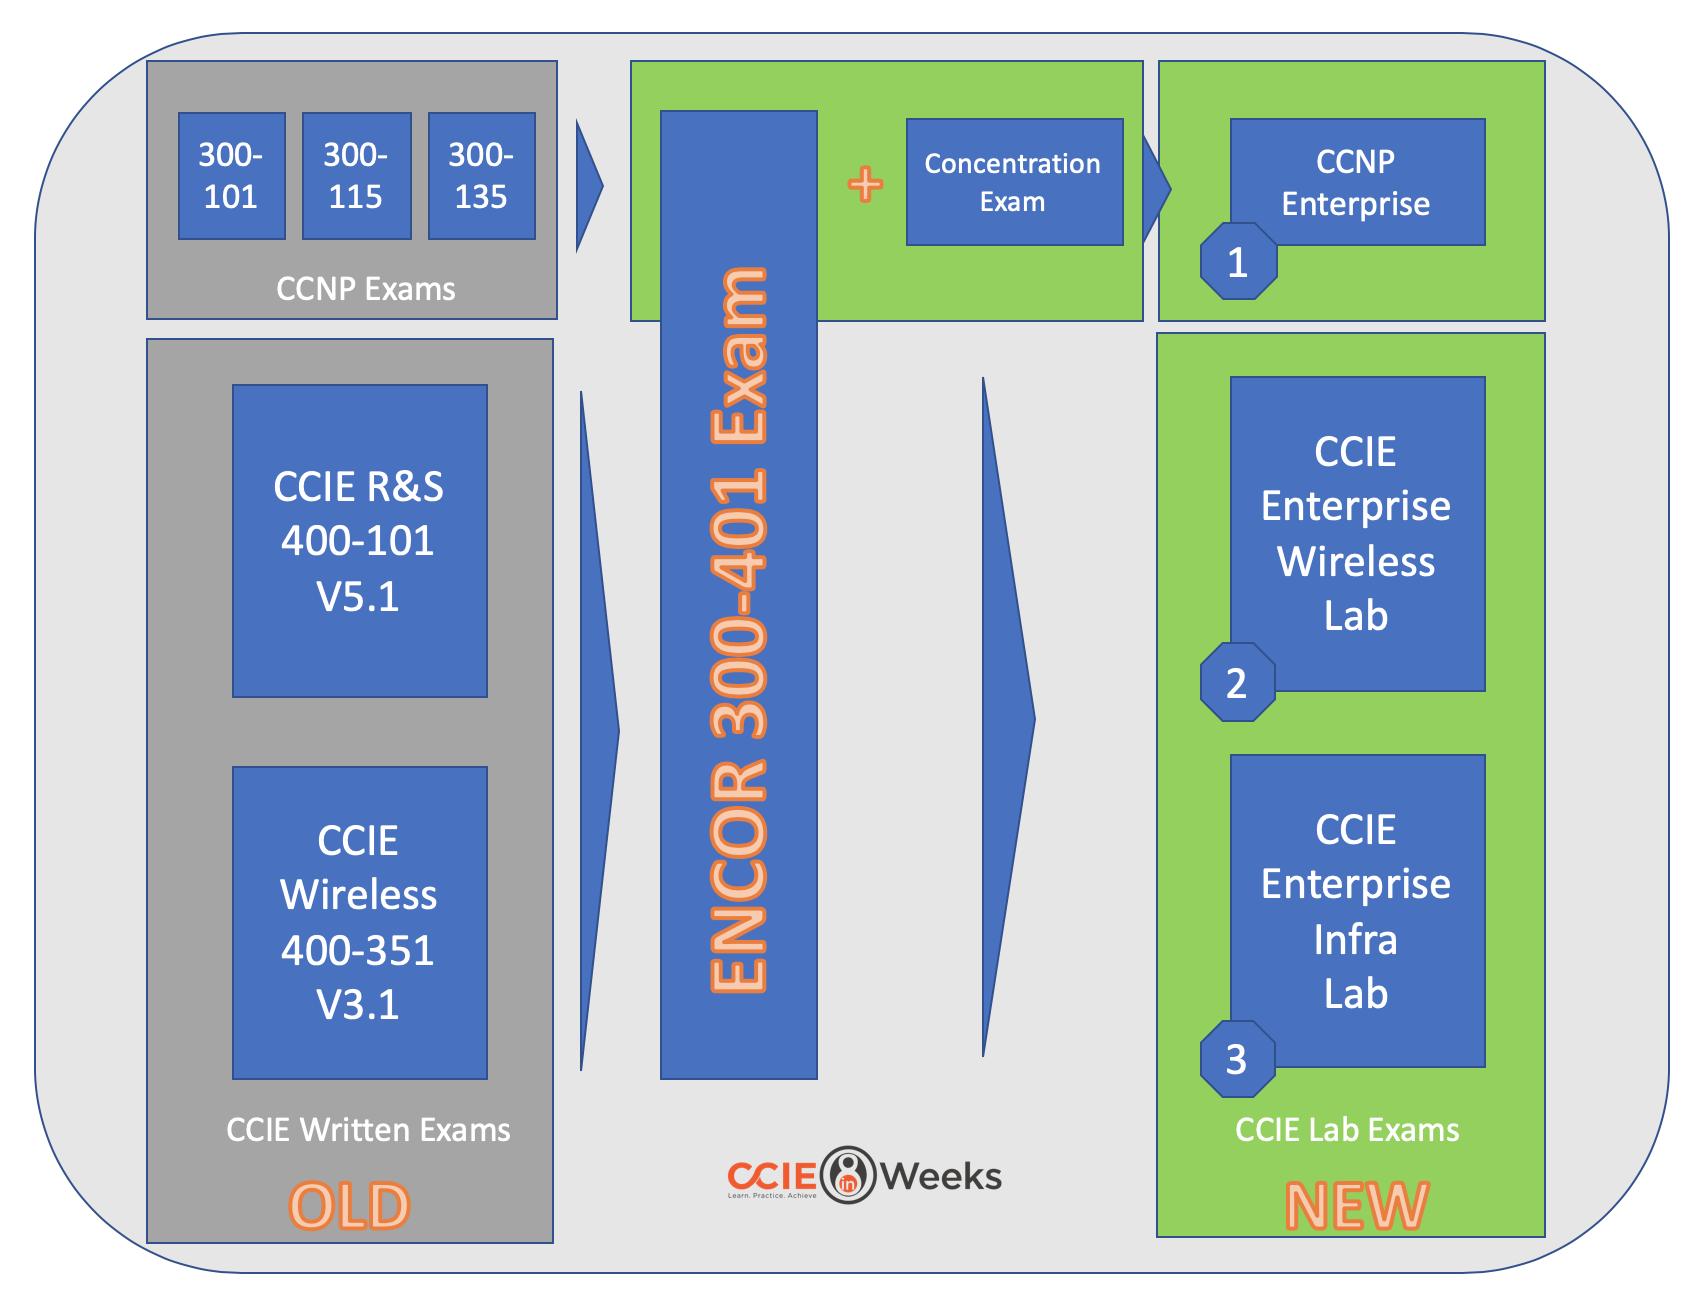 cisco ccie ccnp enterprise core encor 350-401 exam